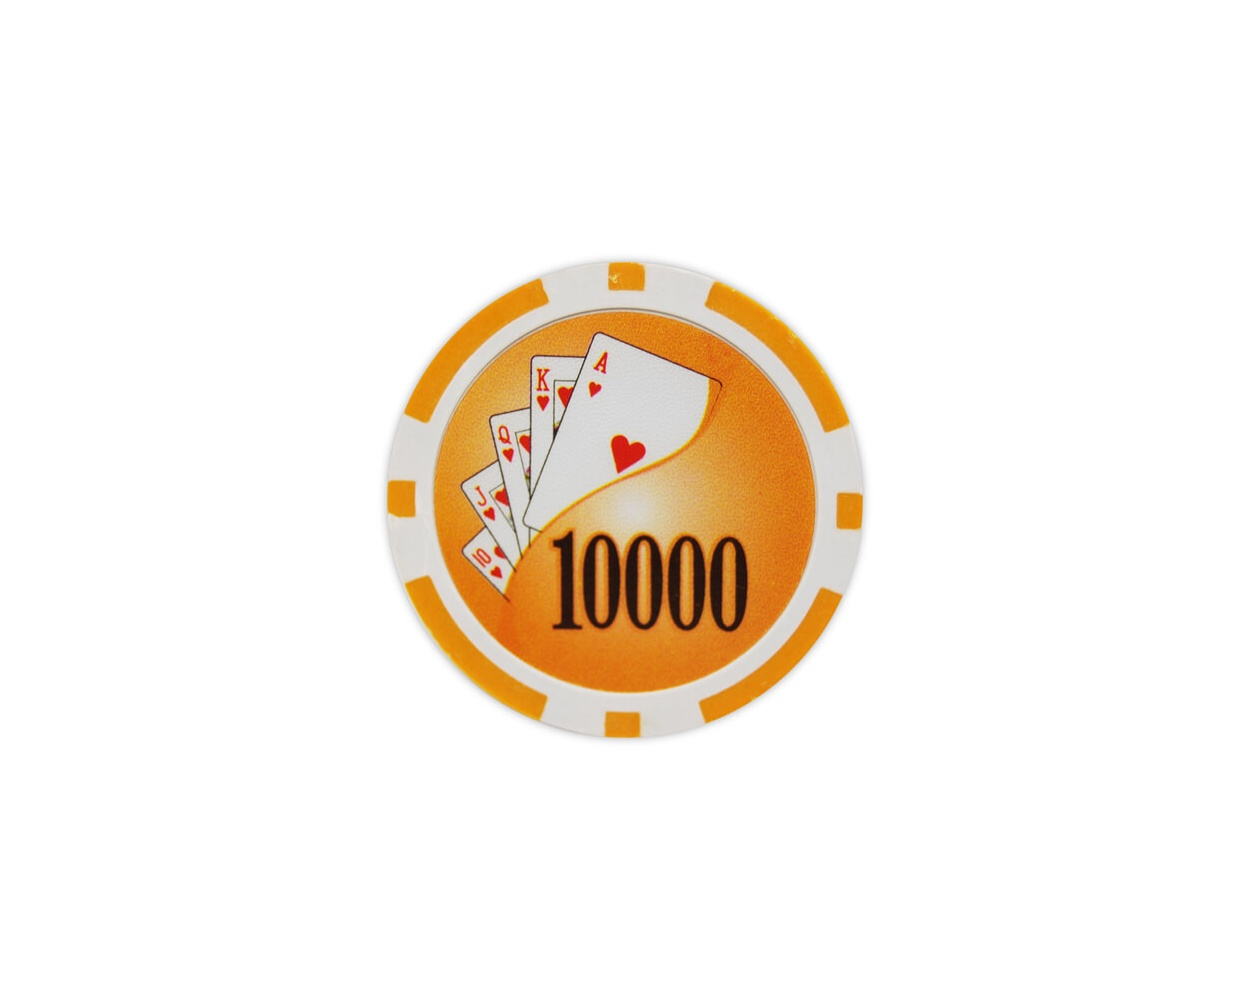 Yin Yang - $10000 Orange Clay Poker Chips